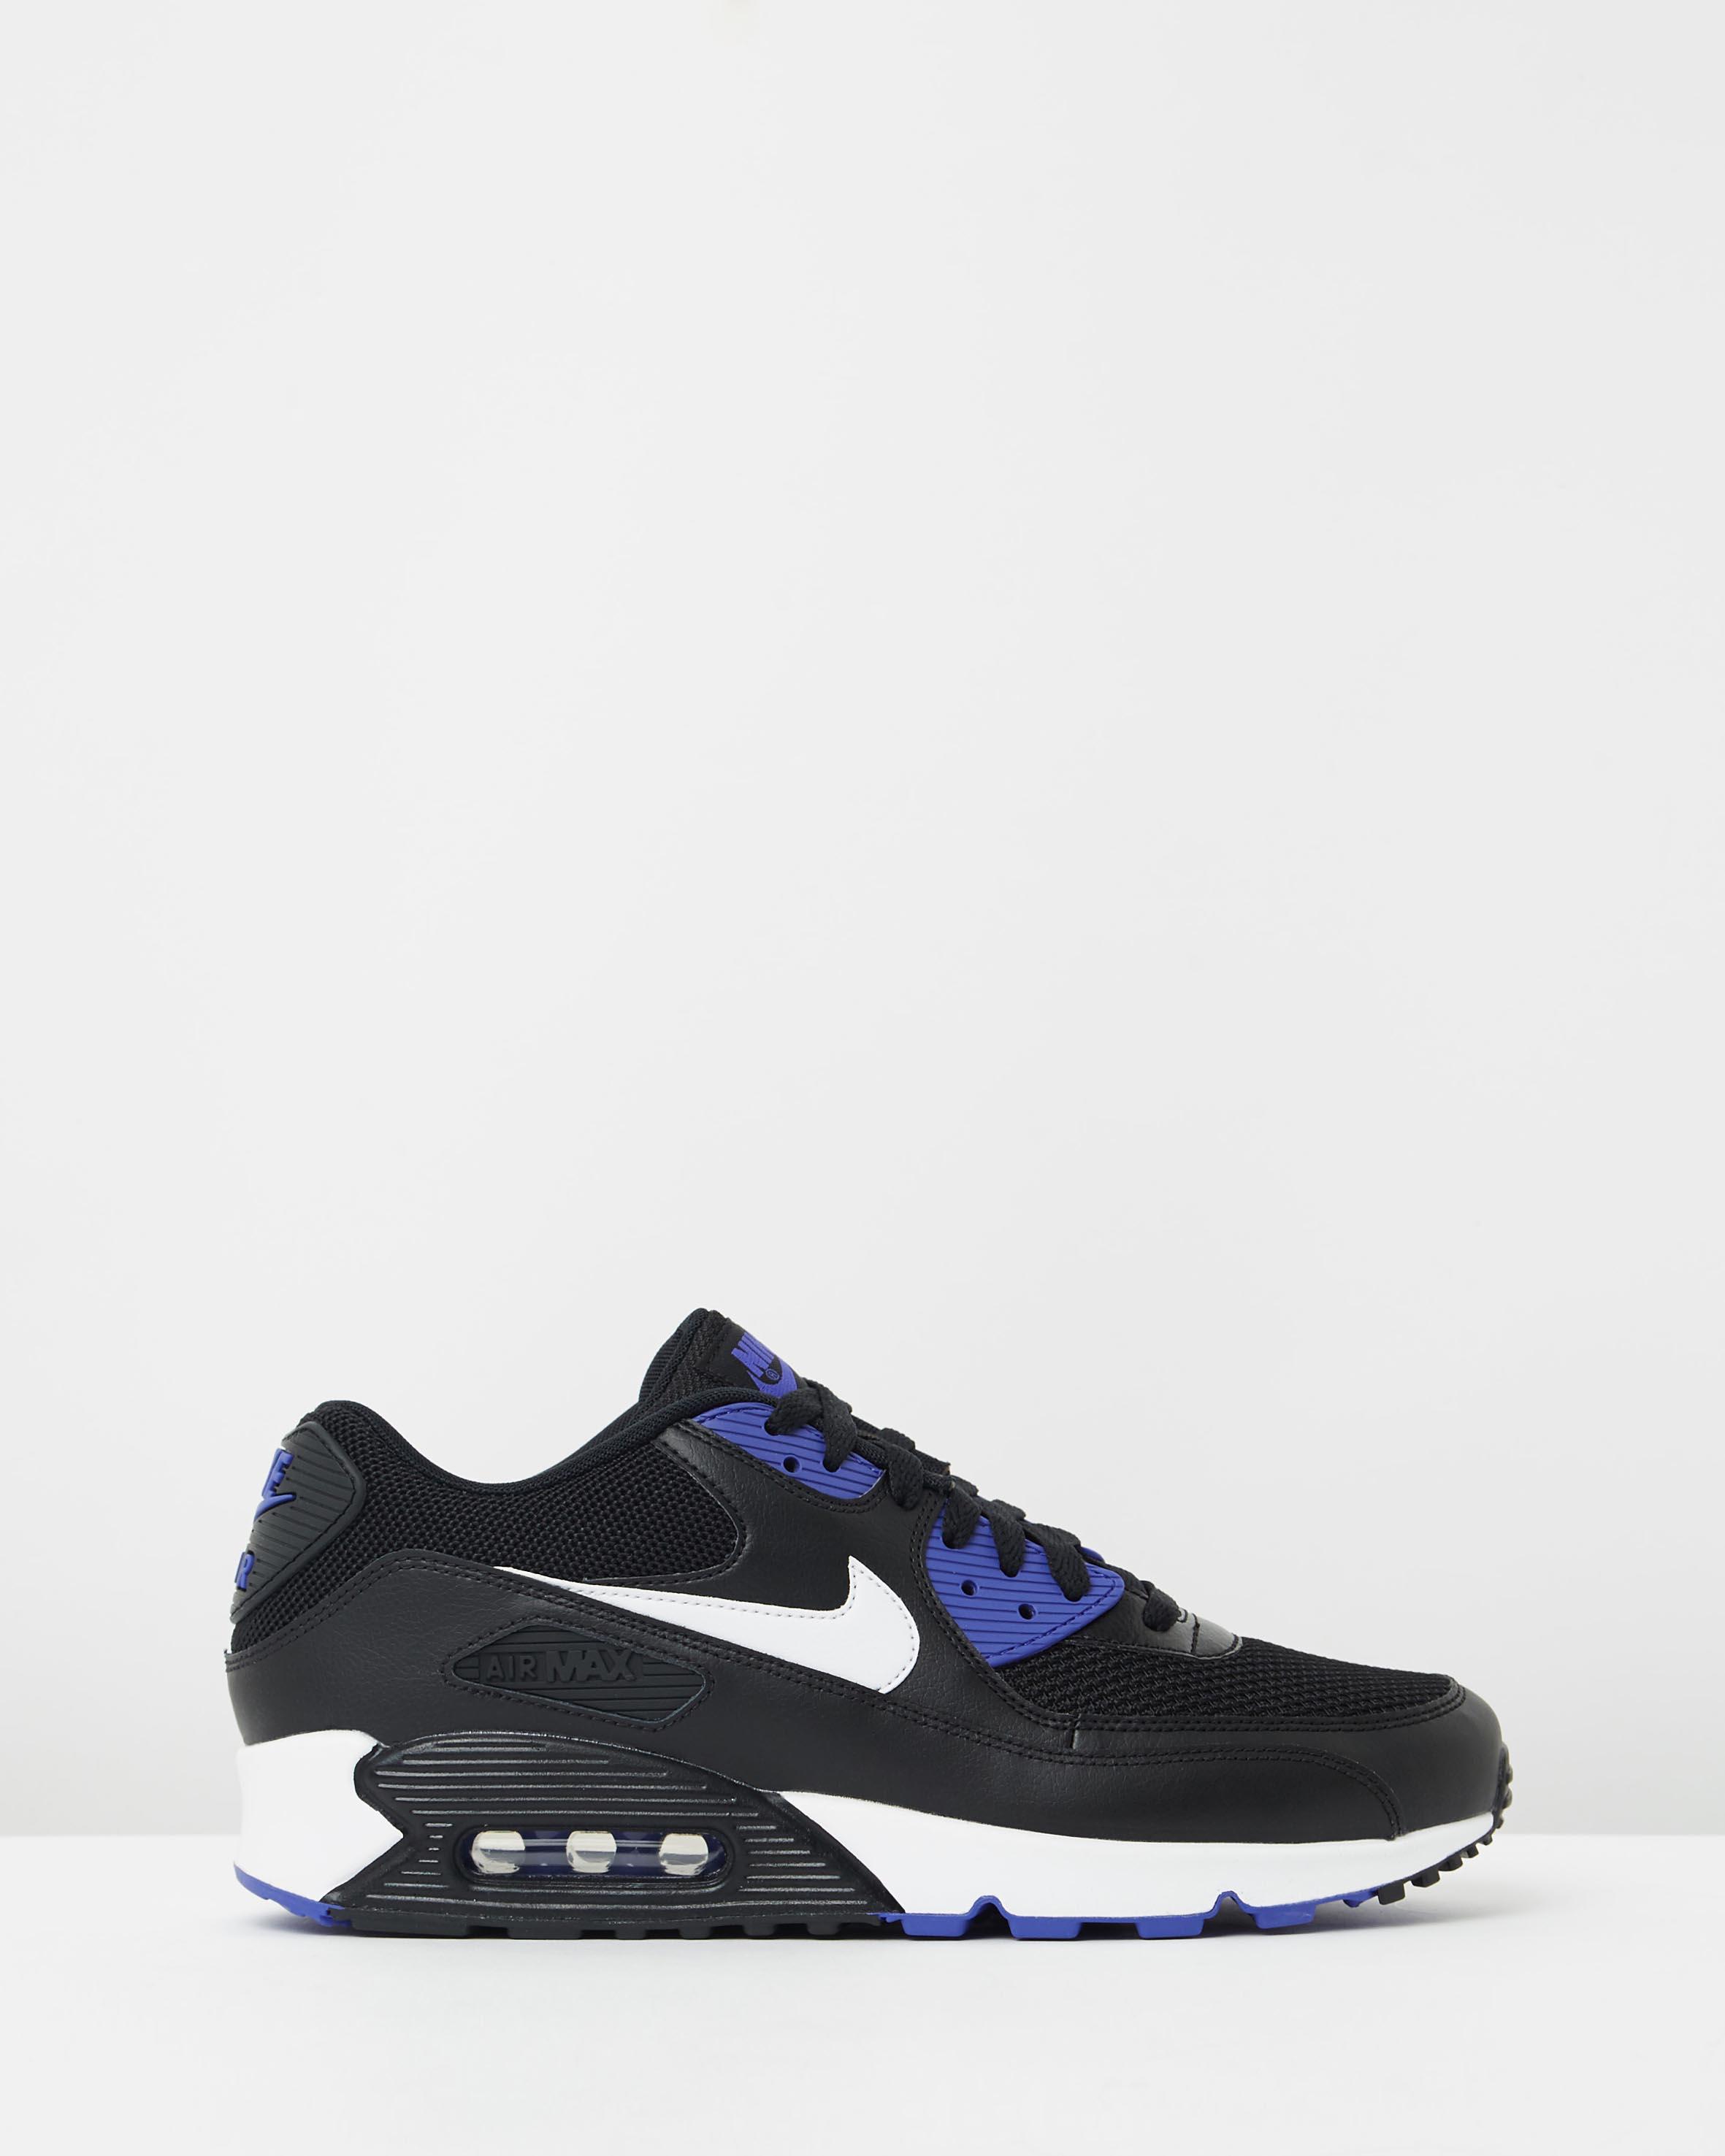 147adf519bd749 Nike Air Max 90 Essential Black White Persian Violet 1 ...